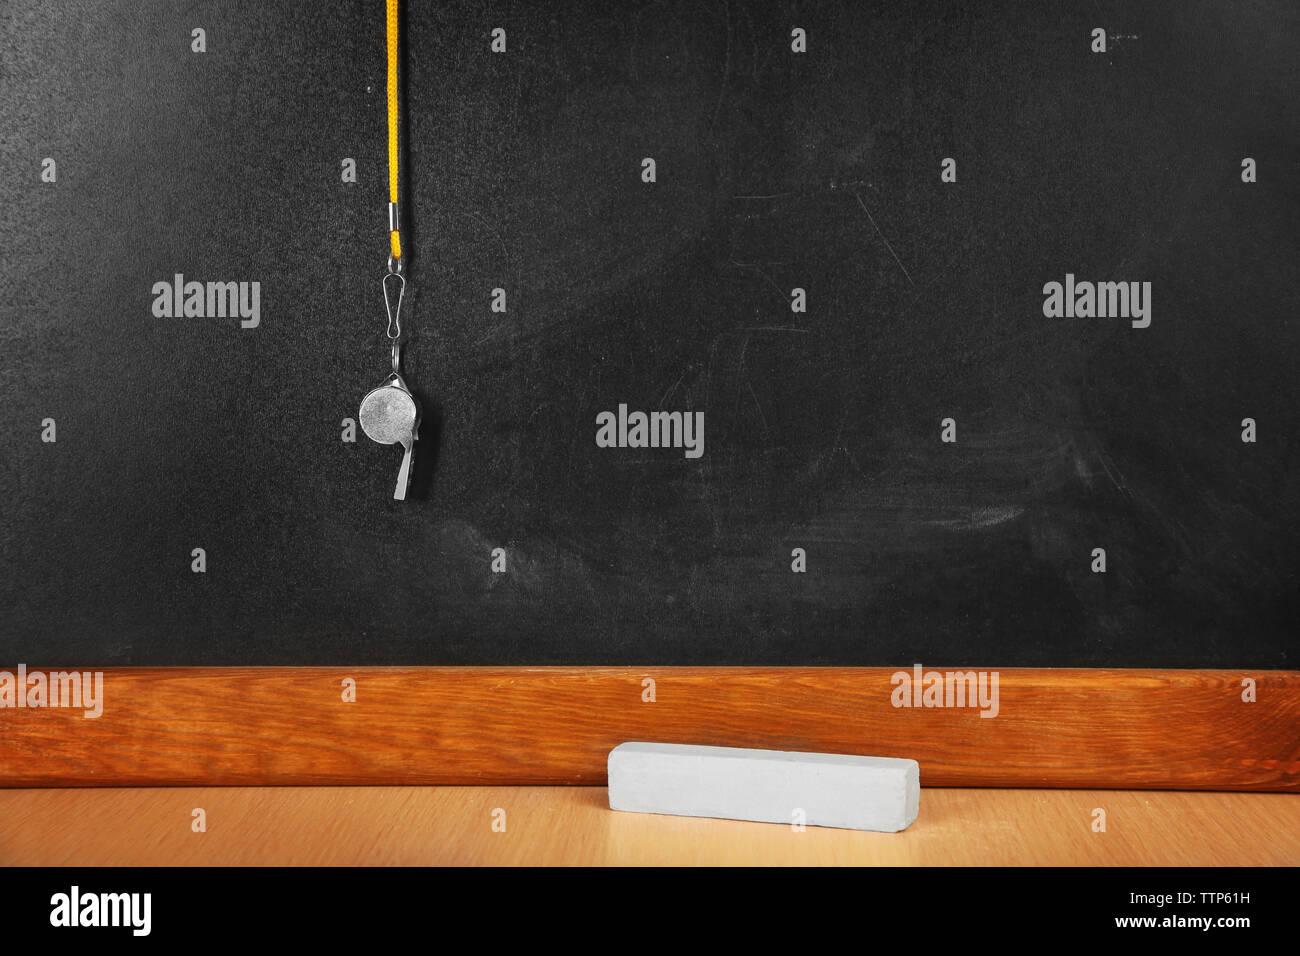 Whistle on blackboard background Stock Photo